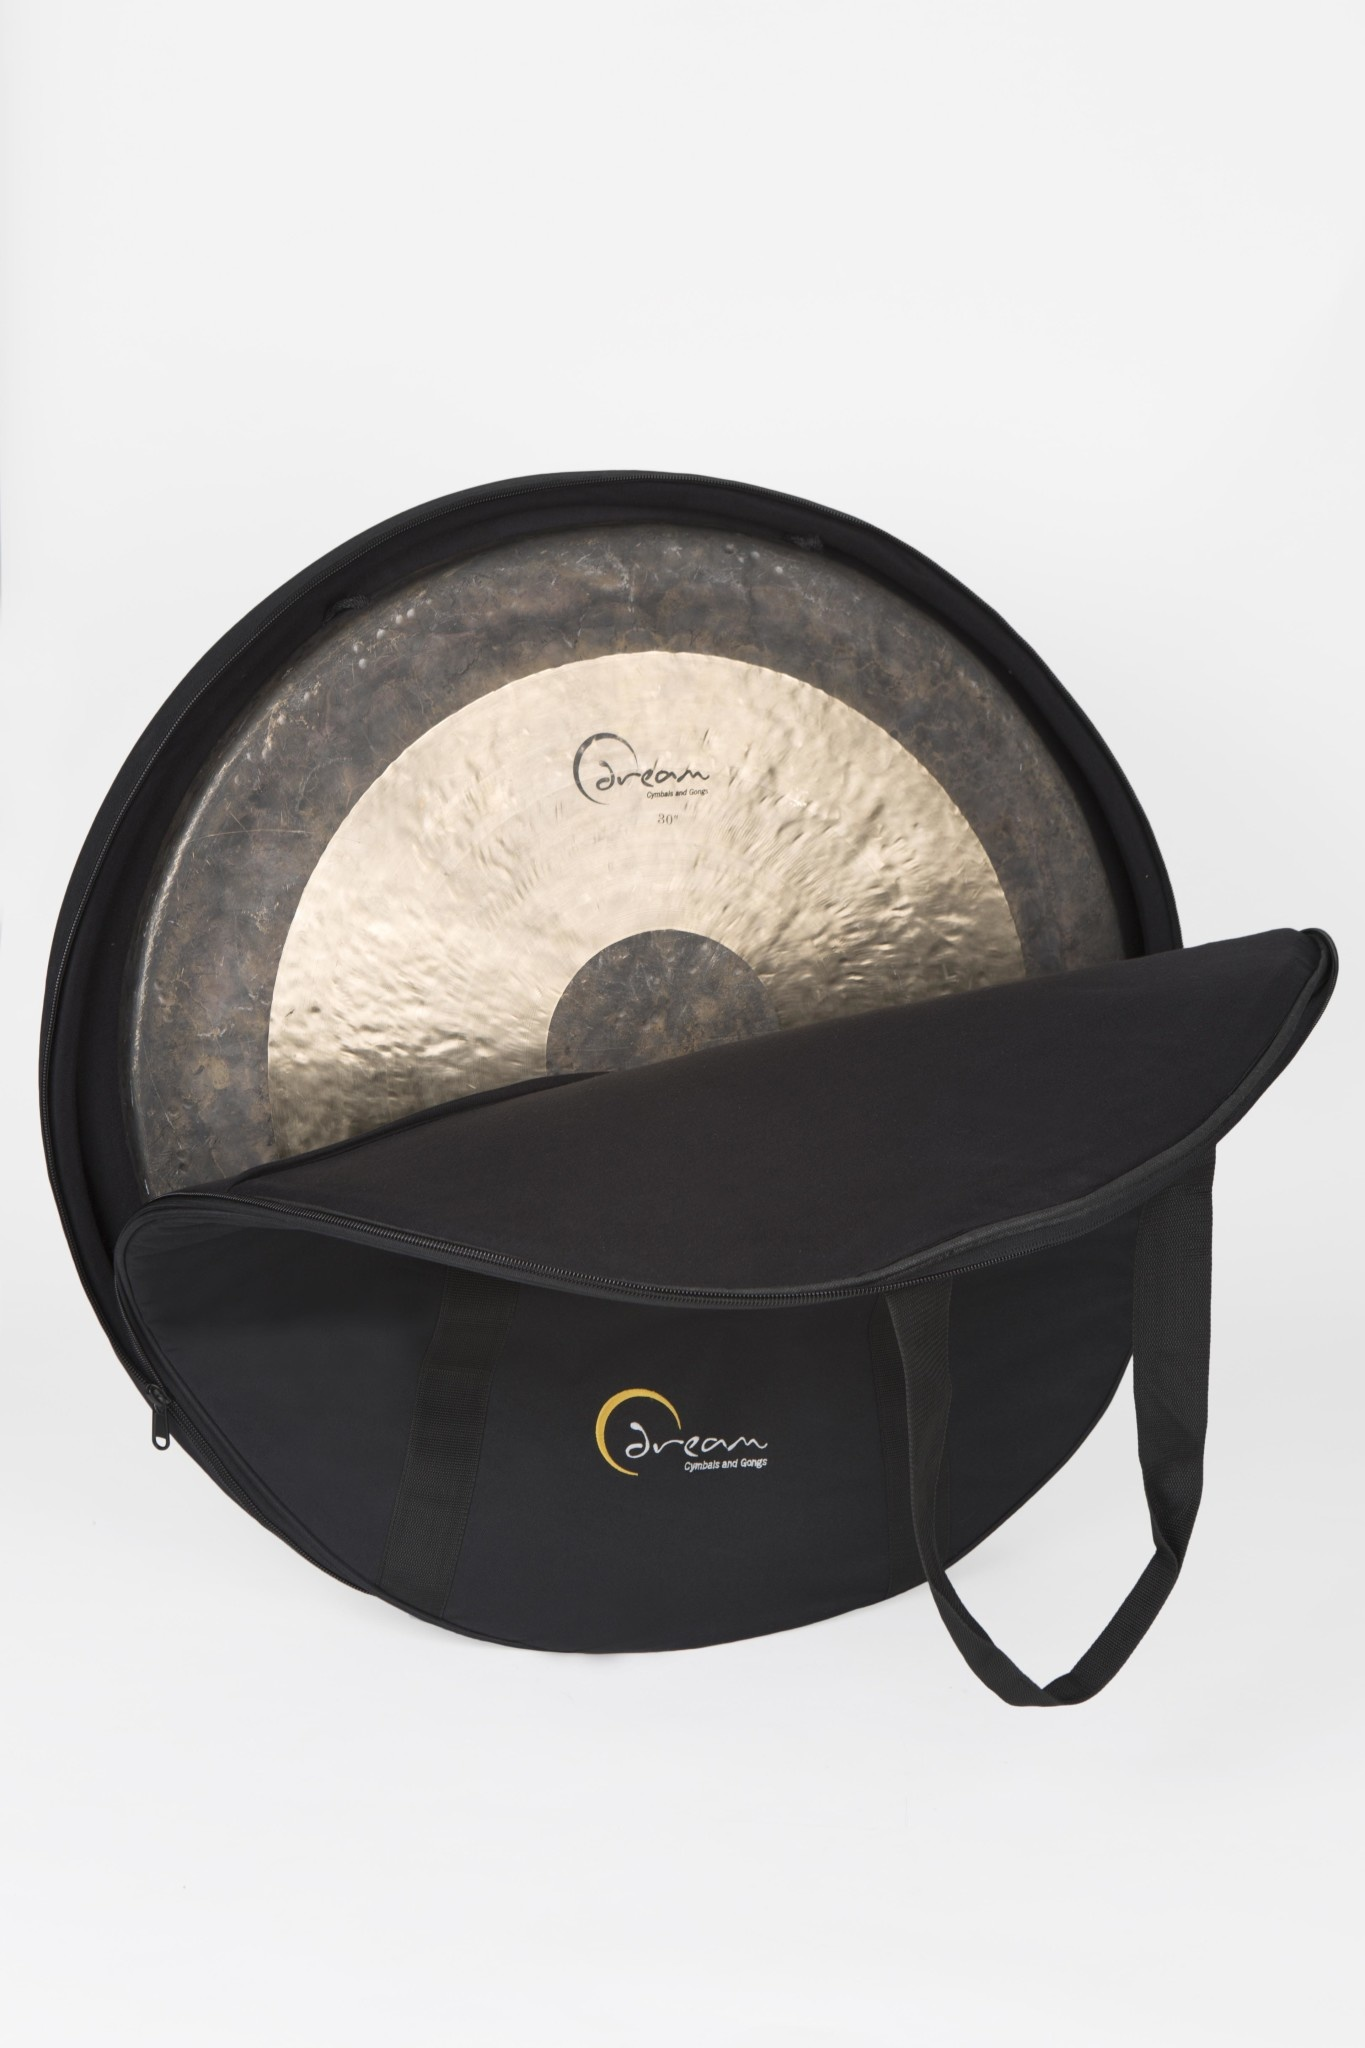 Dream Dream Gong Bag 32in